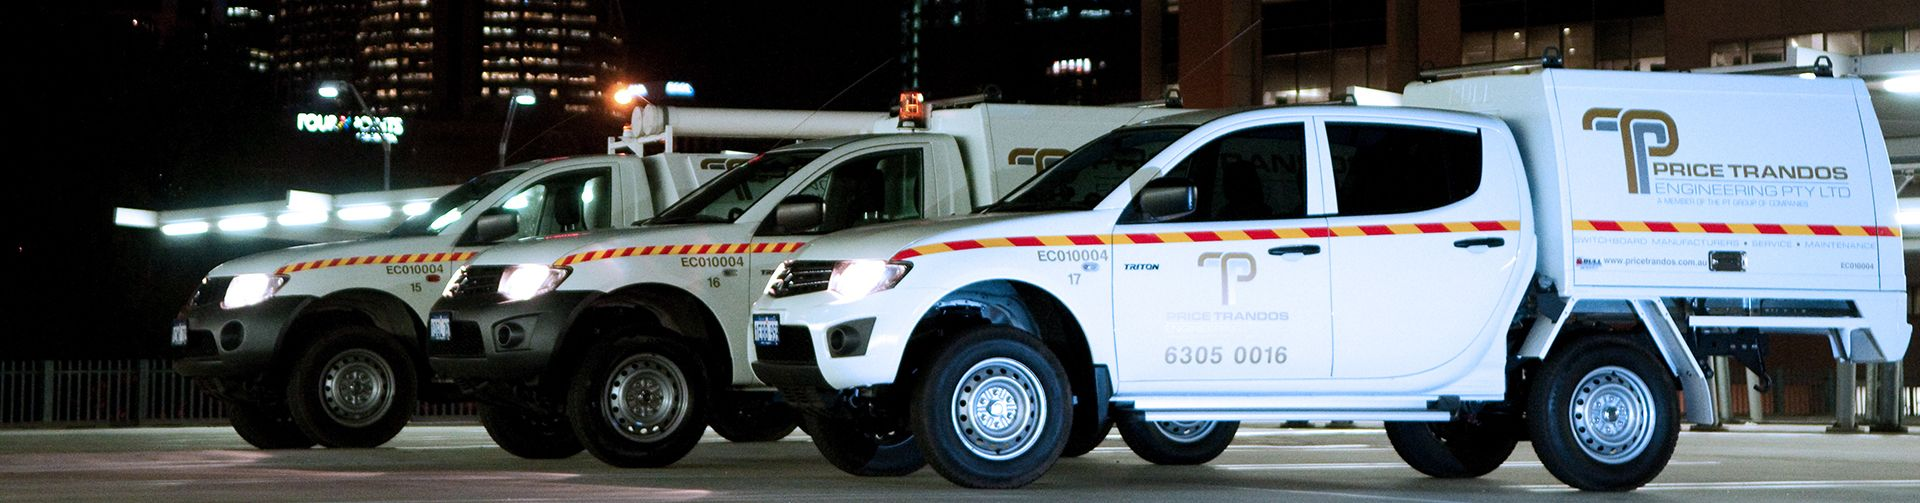 Price Trandos Fleet of Service Vehicles